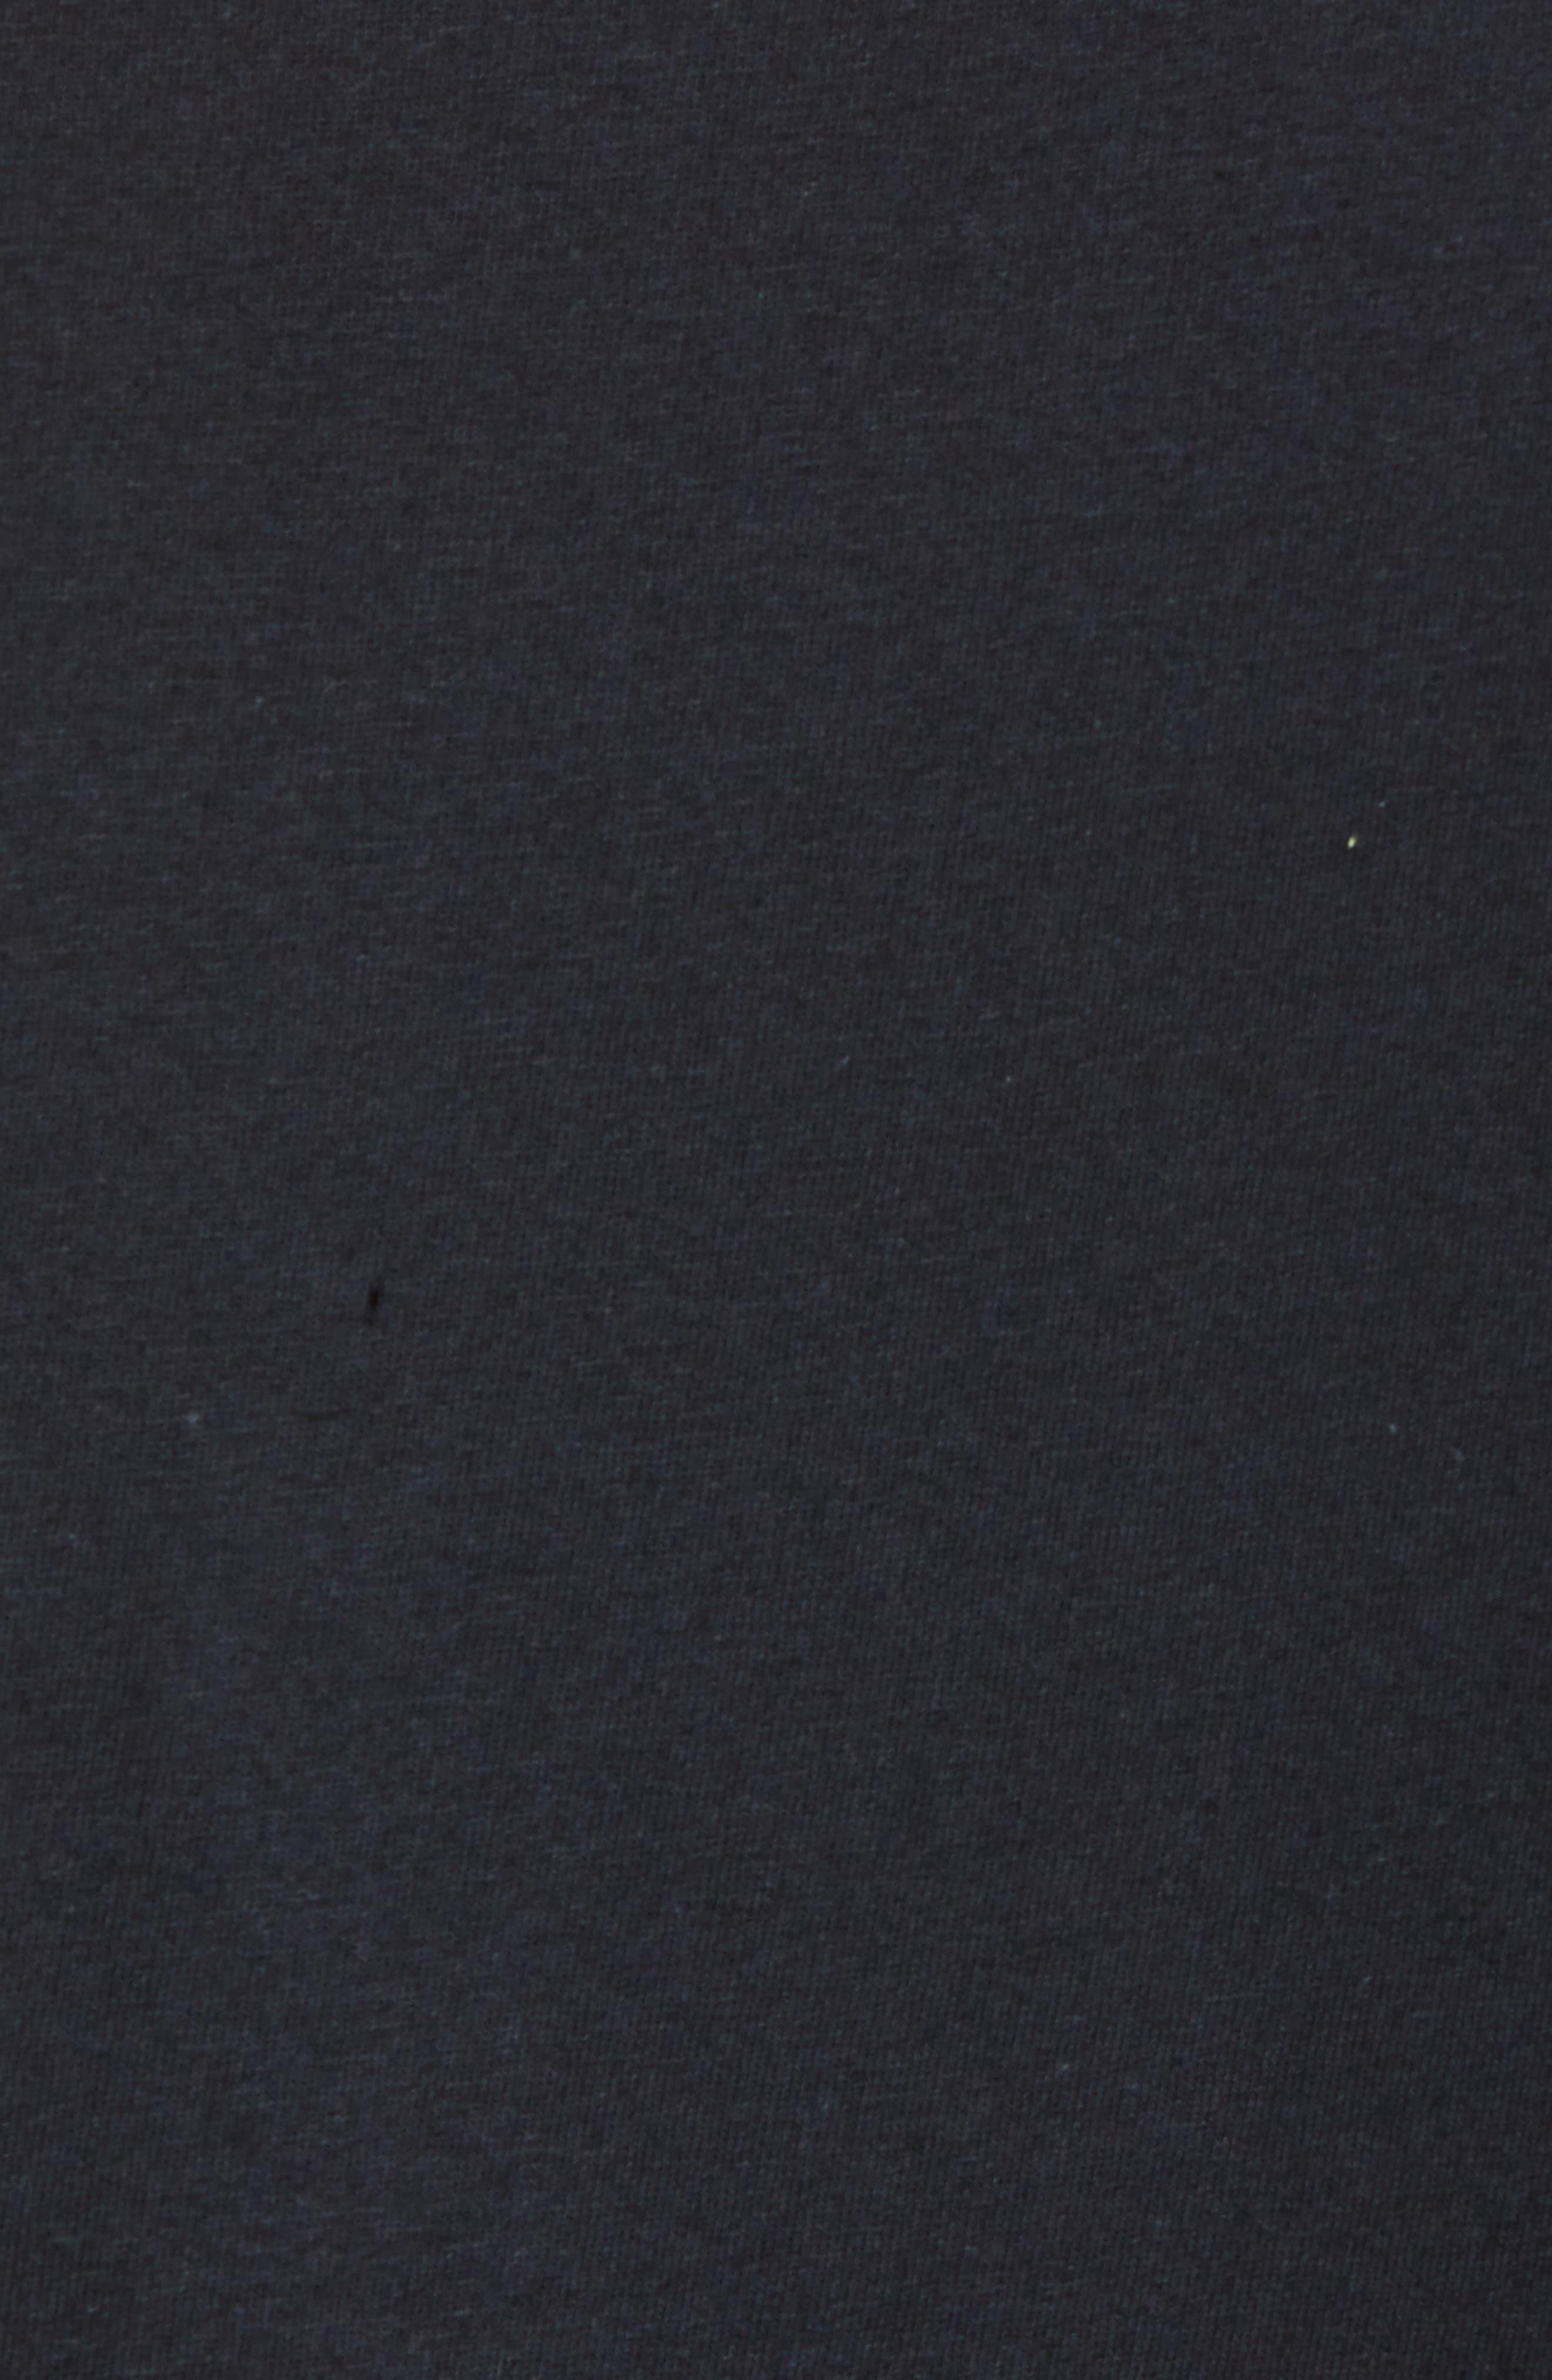 Run-DMC T-Shirt,                             Alternate thumbnail 5, color,                             Black Tee Run Dmc